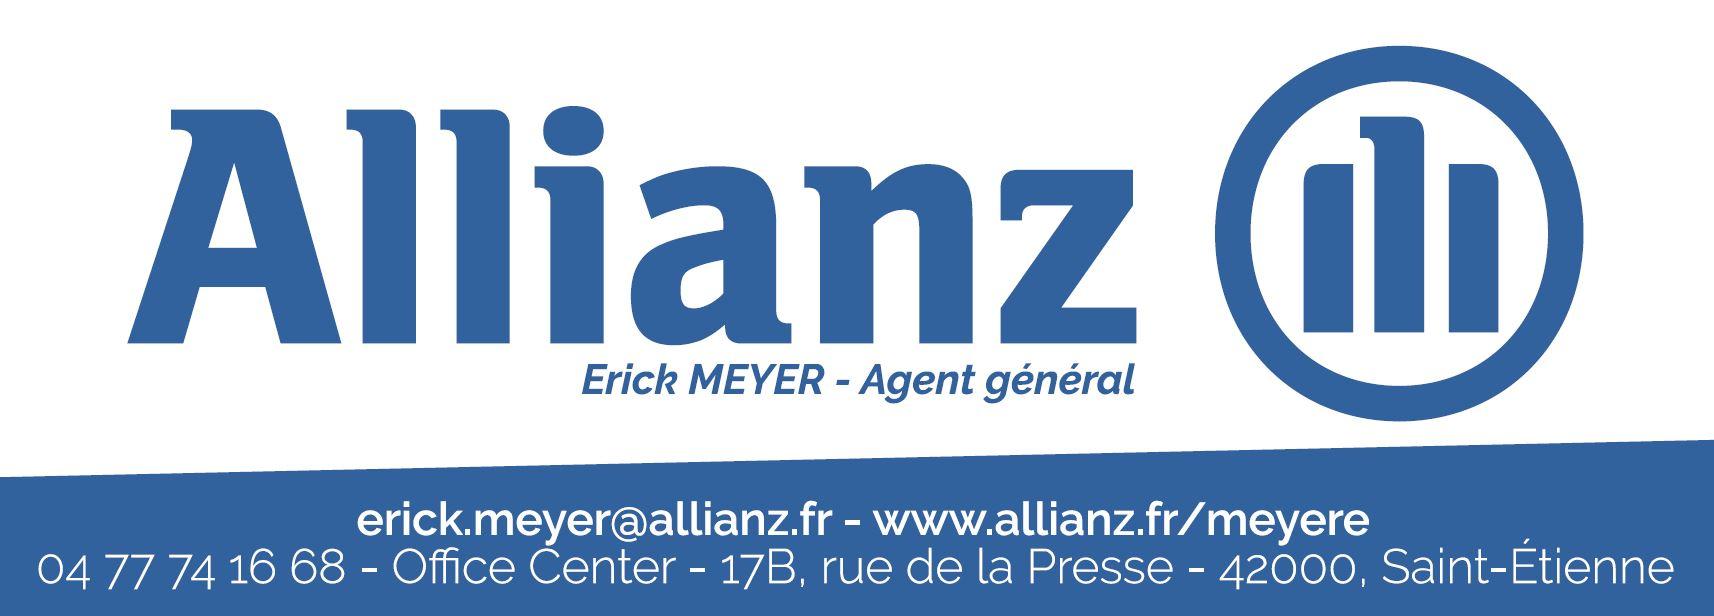 ALLIANZ ERICK MEYER